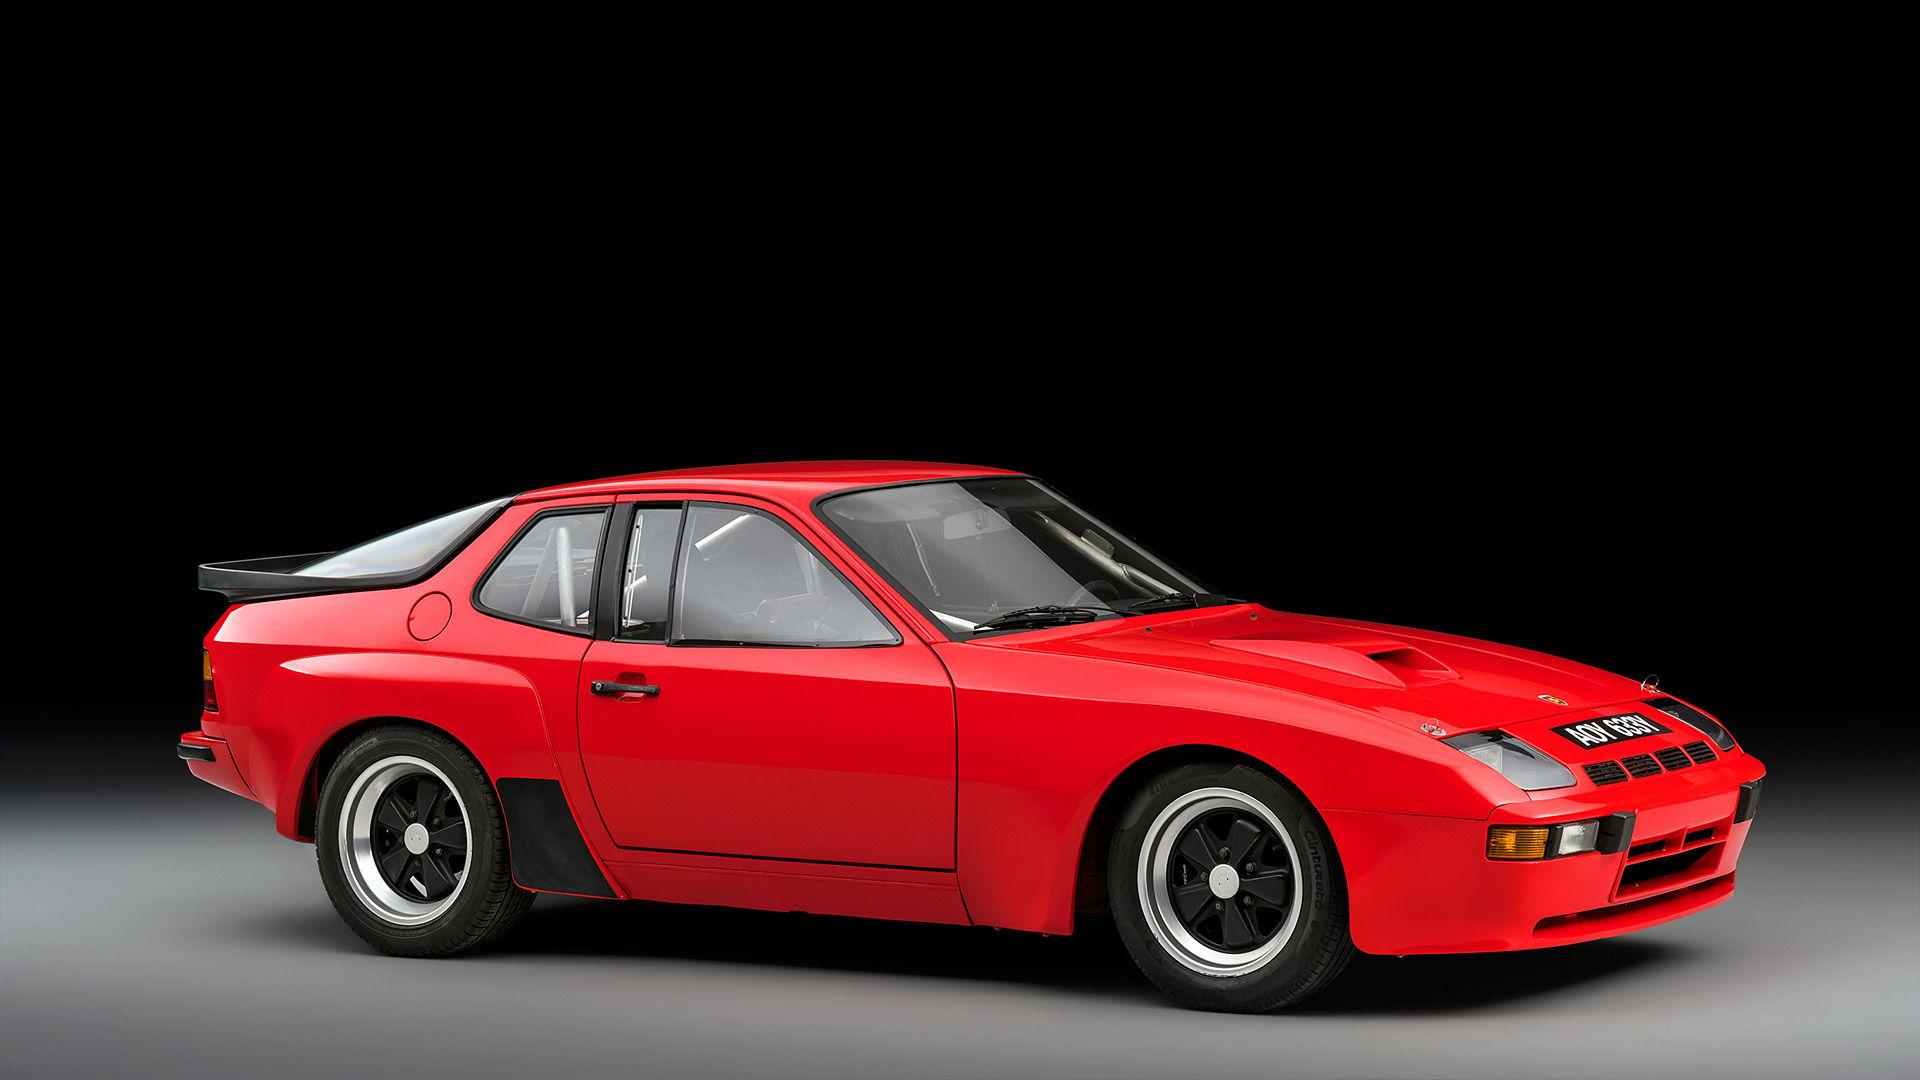 1981 Porsche 924 Carrera GTS